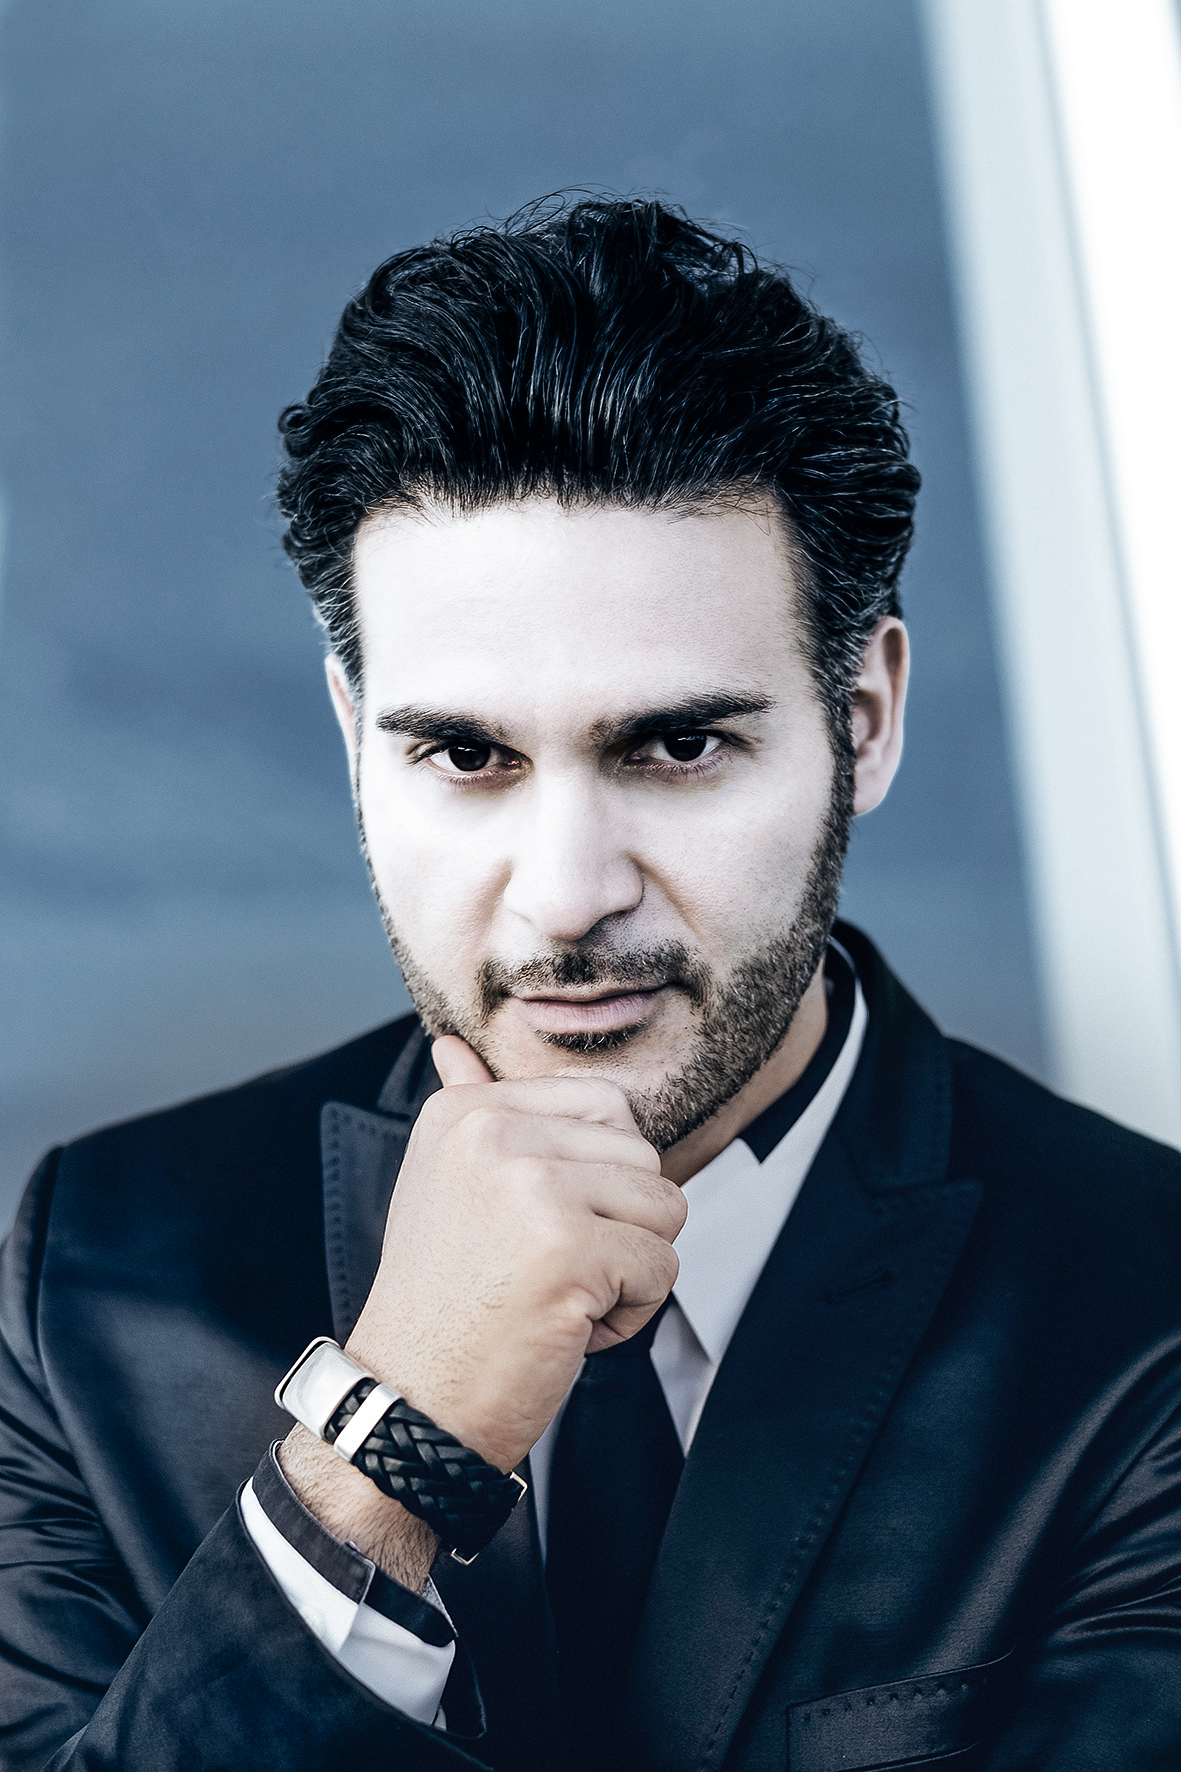 Sänger / Moderator / Entertainer Fabrizio Levita